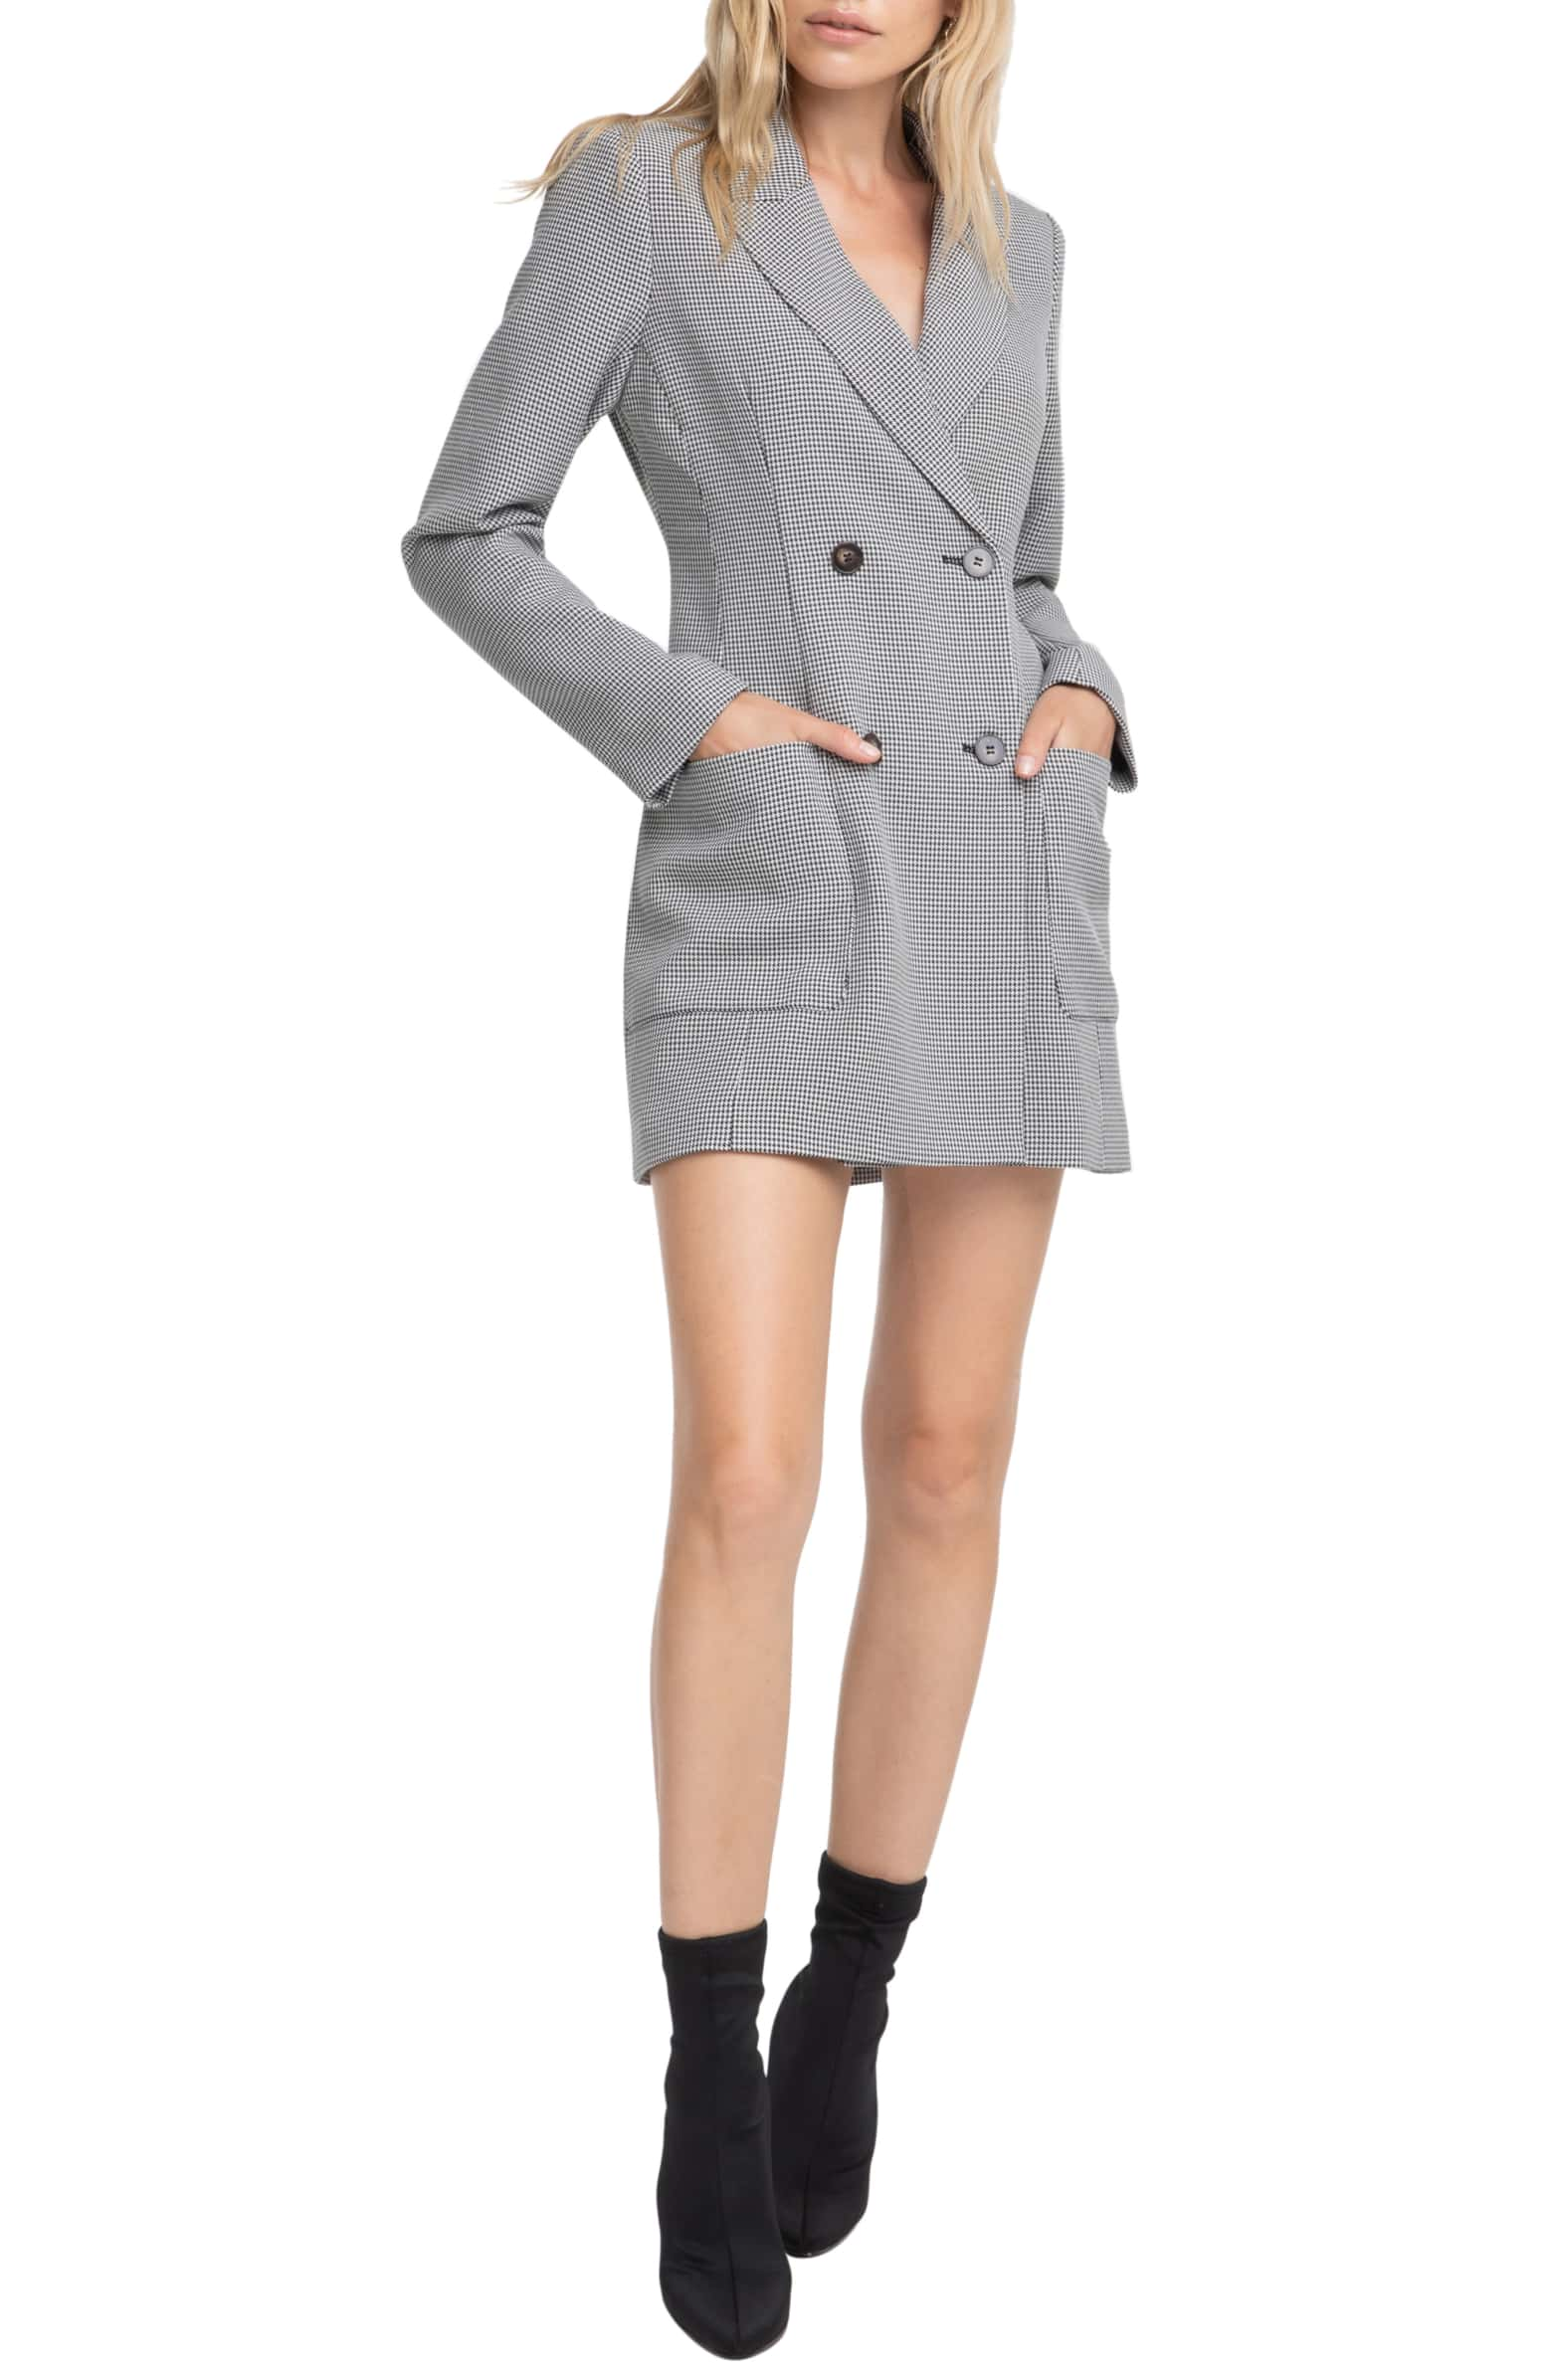 Houndstooth Blazer Dress - $148